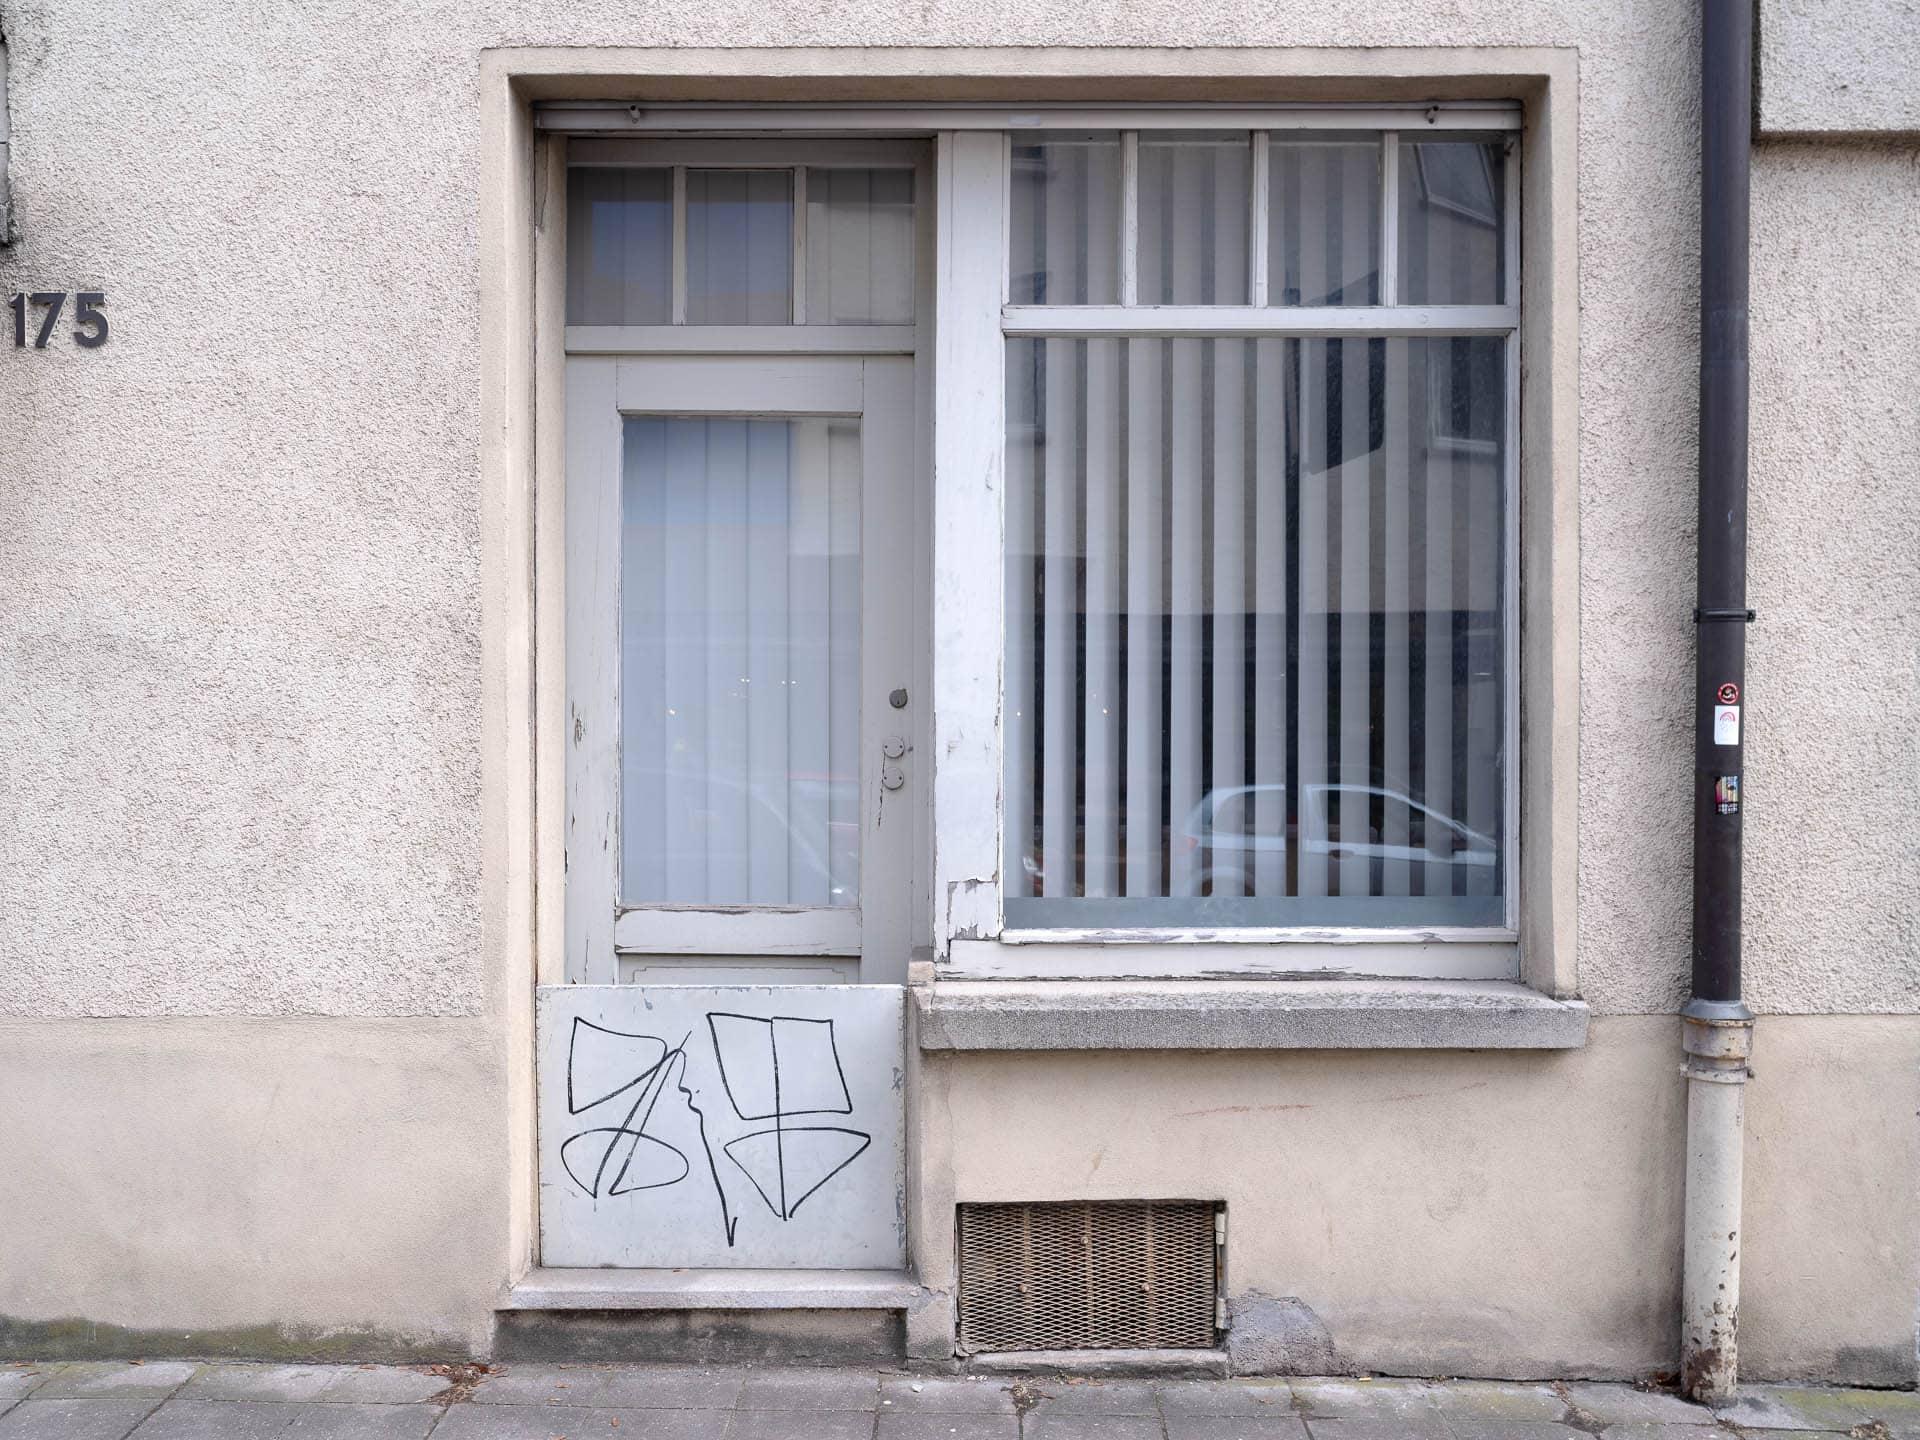 Architekturfotograf Stadtlandschaft Umwidmung Architecural Photographer Cityscape Rededication